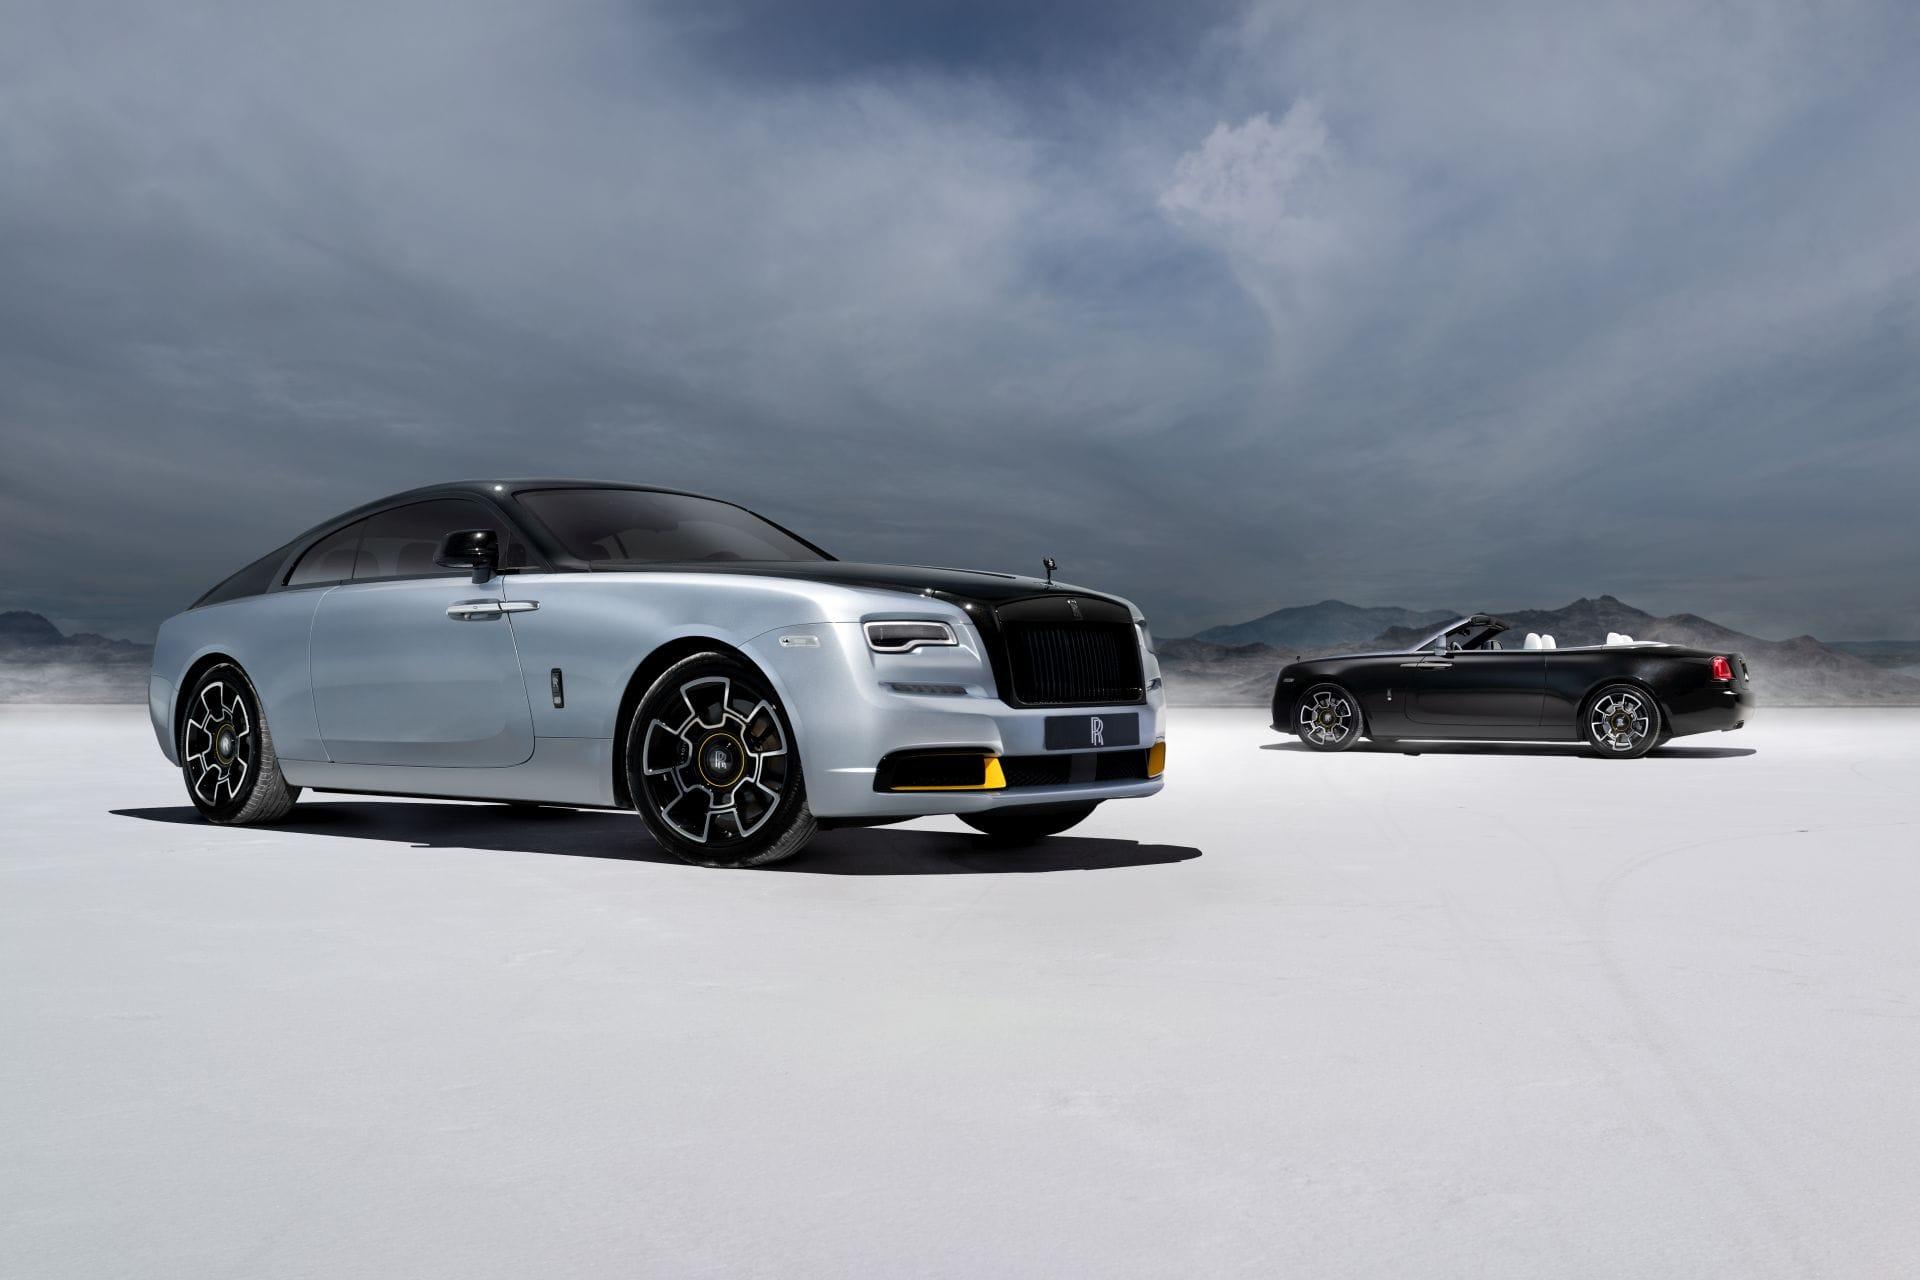 Rolls Royce Landspeed Collection 159